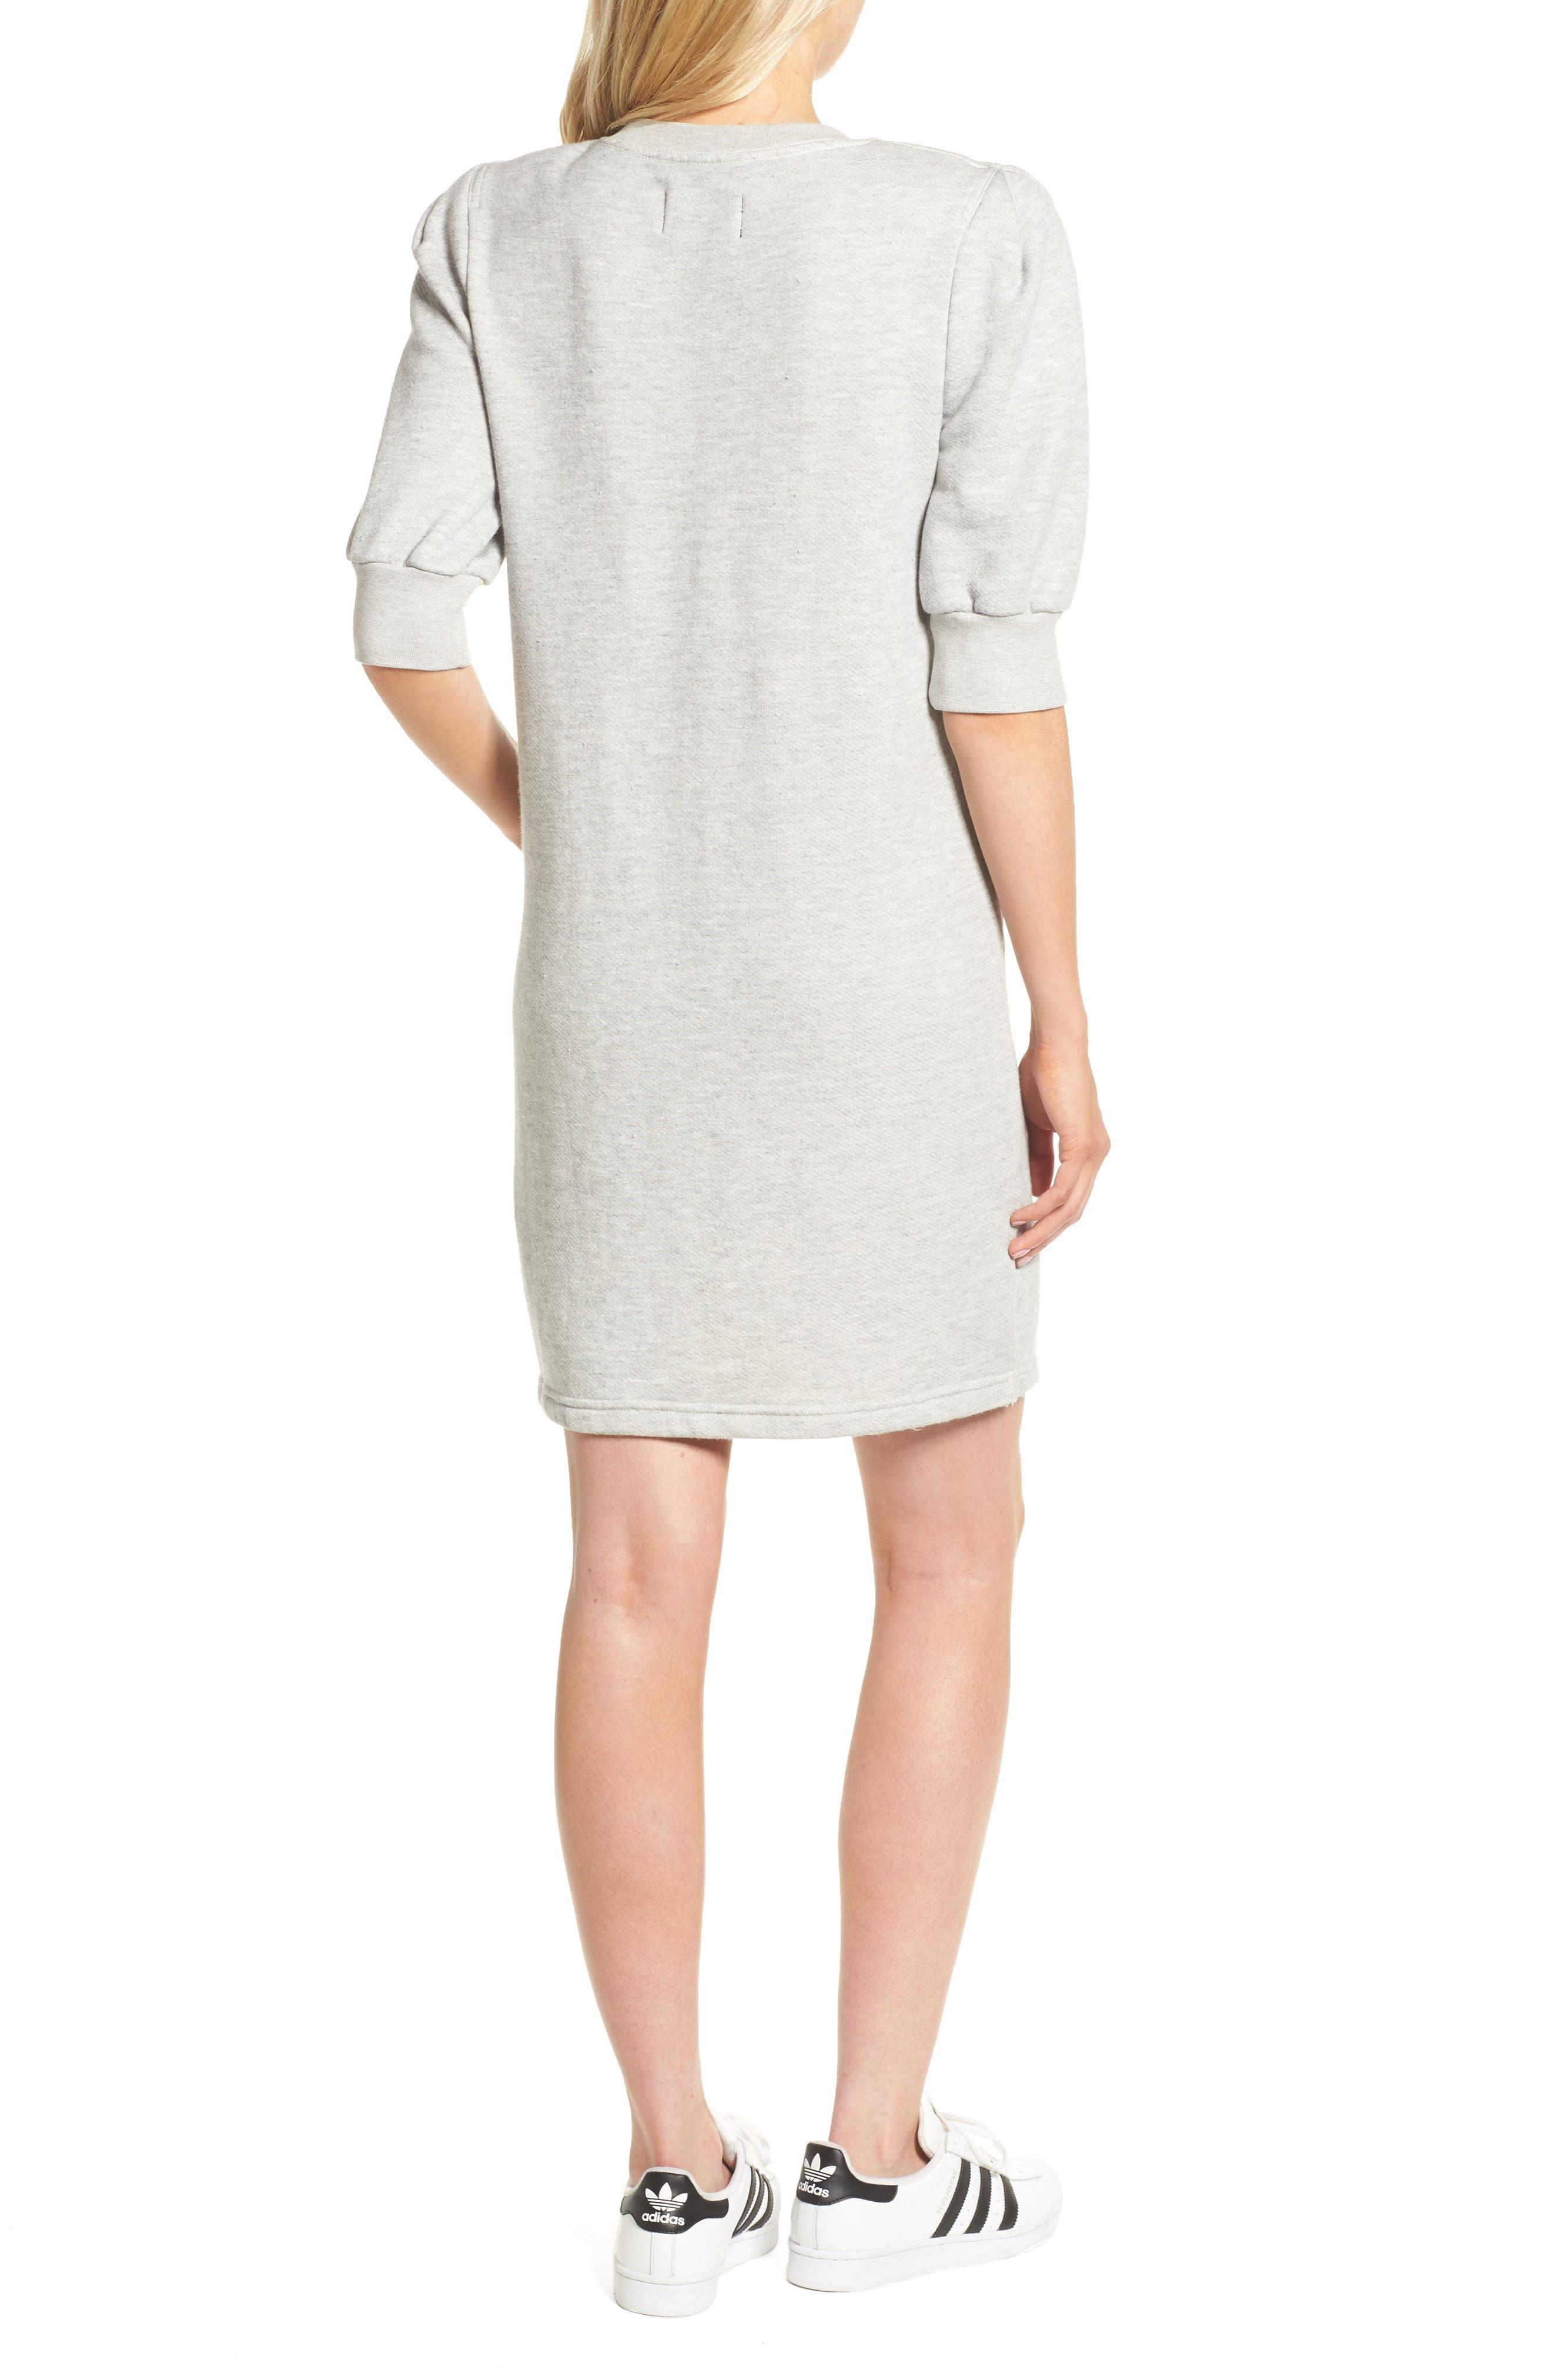 The Pleat Sweatshirt Dress,                             Alternate thumbnail 2, color,                             Light Heather Grey Terry